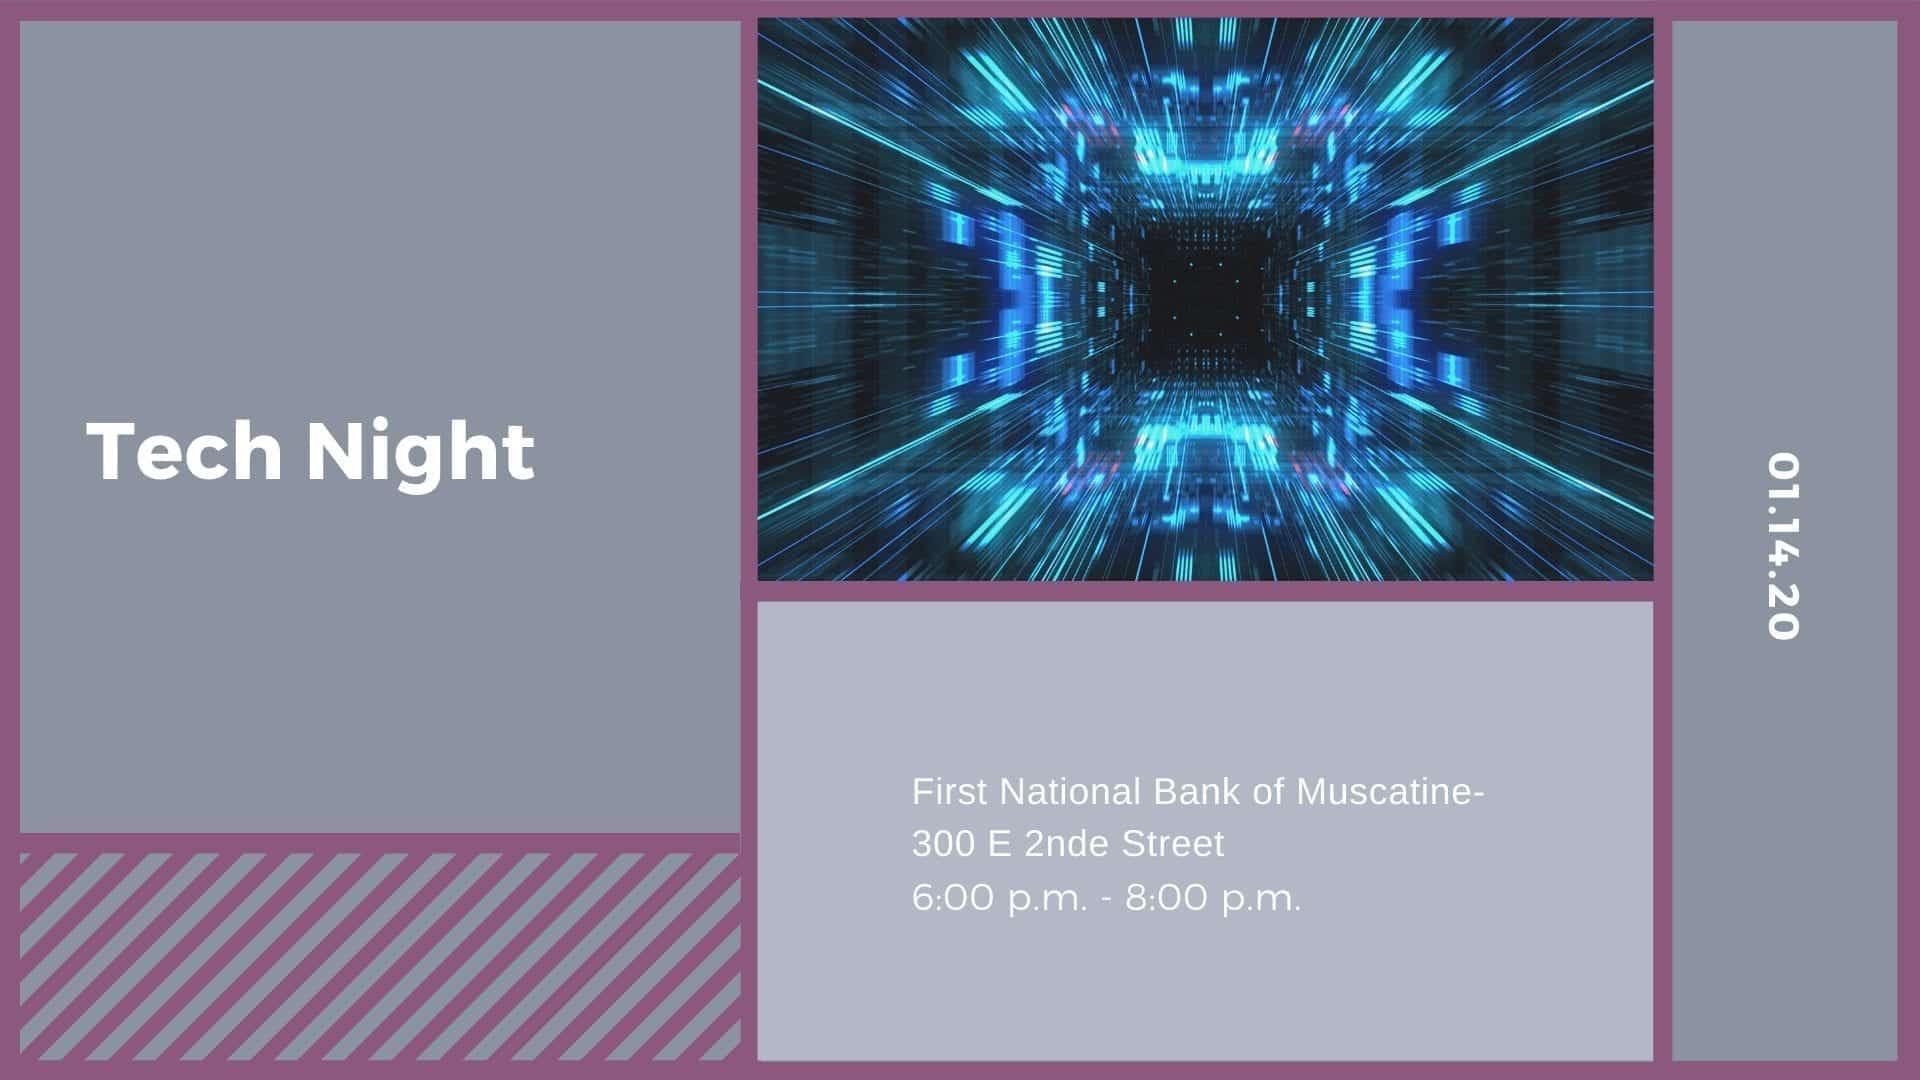 Tech Night